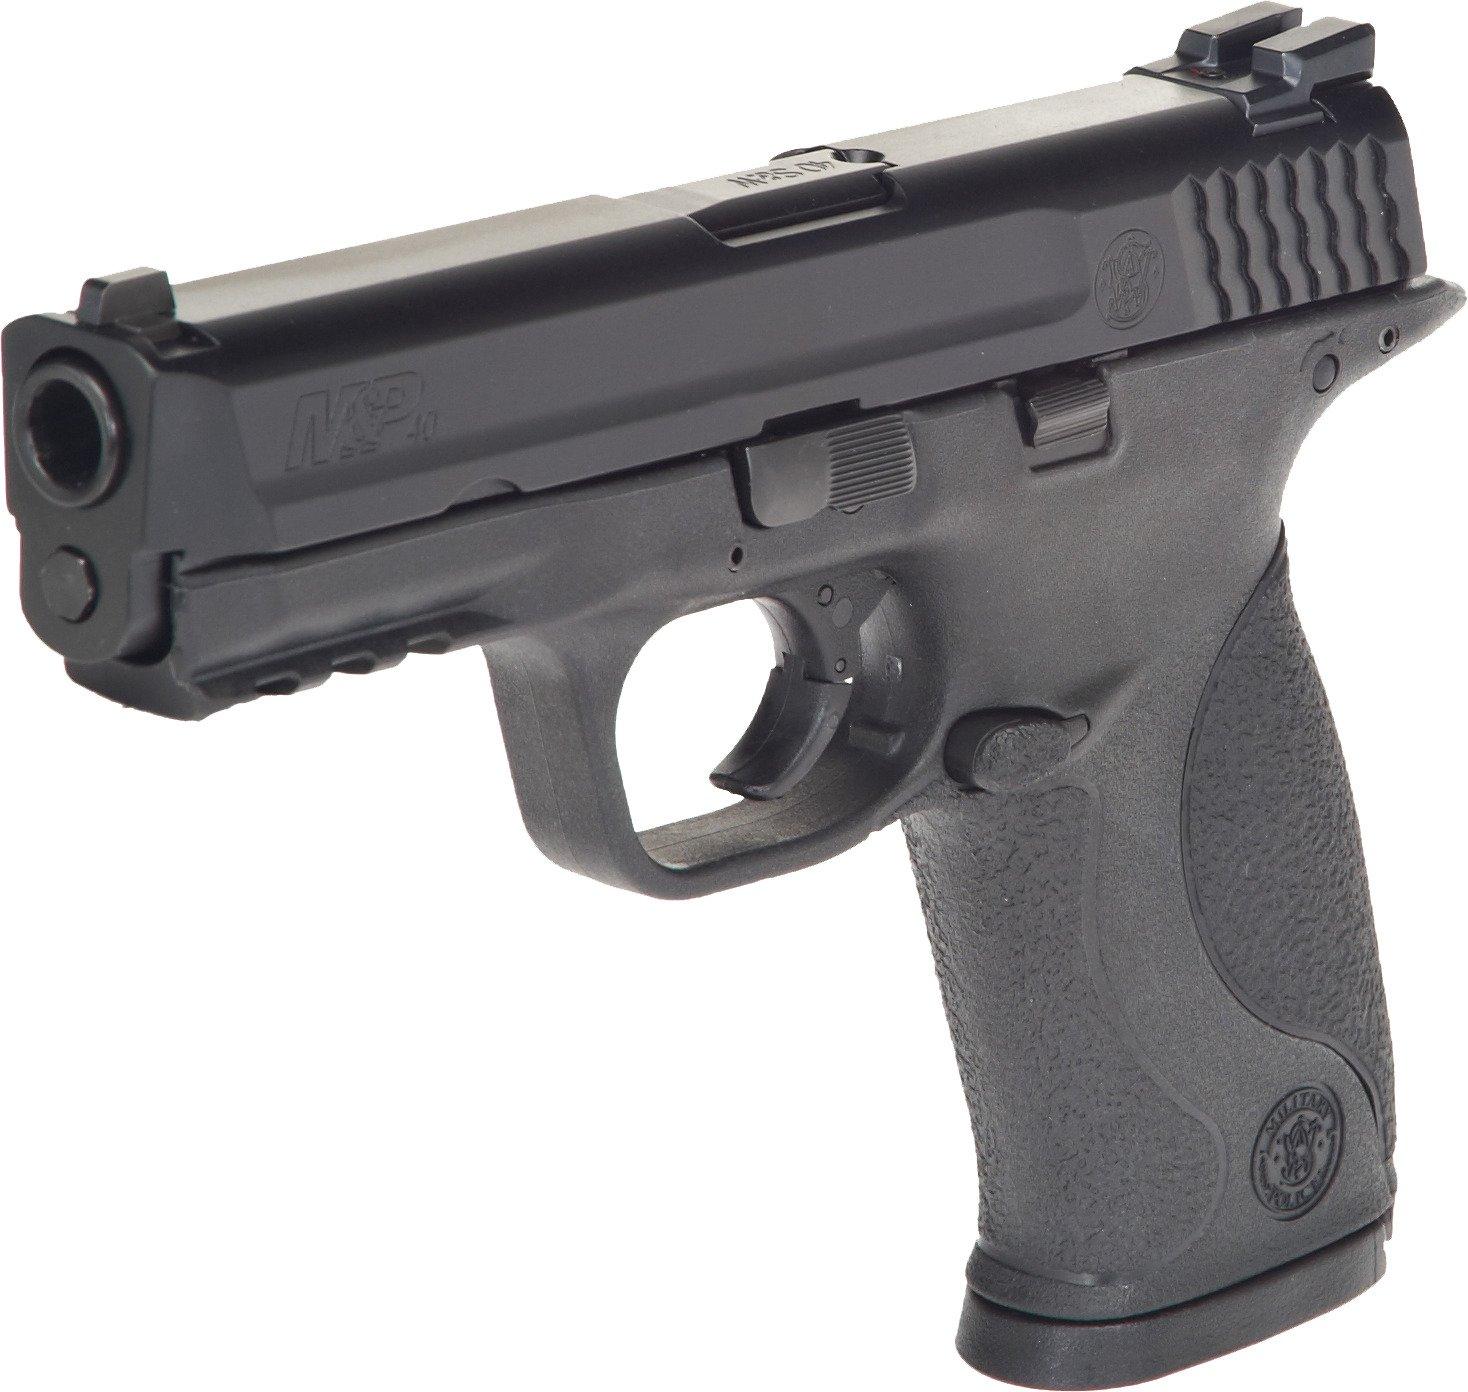 Centerfire Pistols